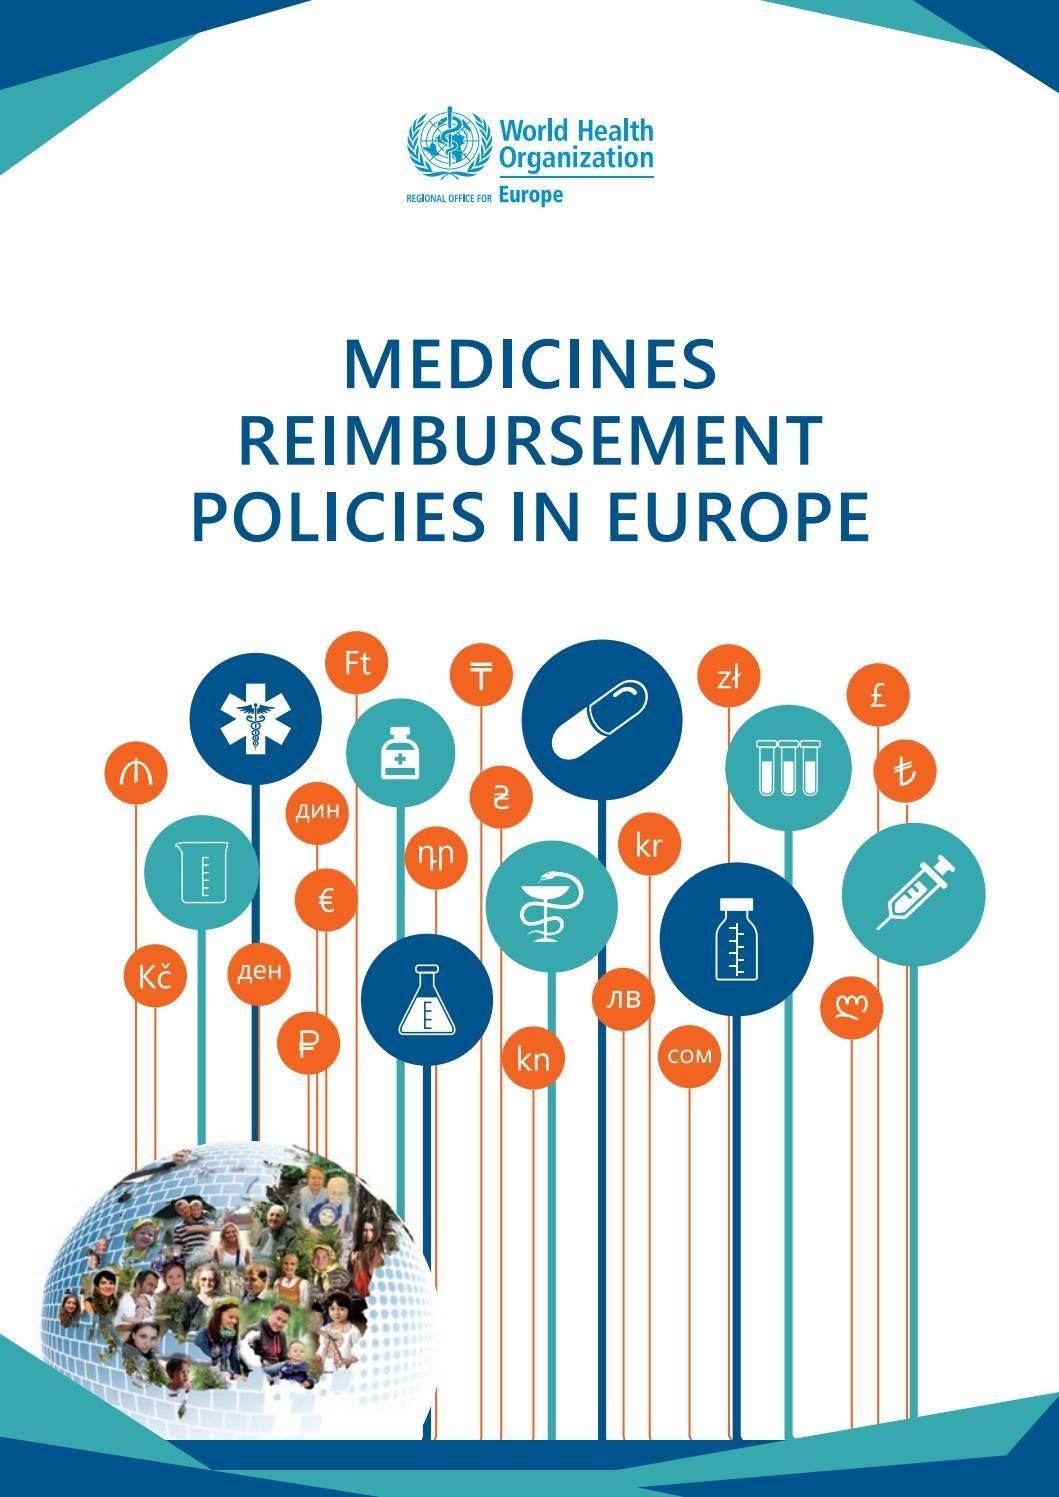 Medicines Reimbursement Policies In Europe By World Health